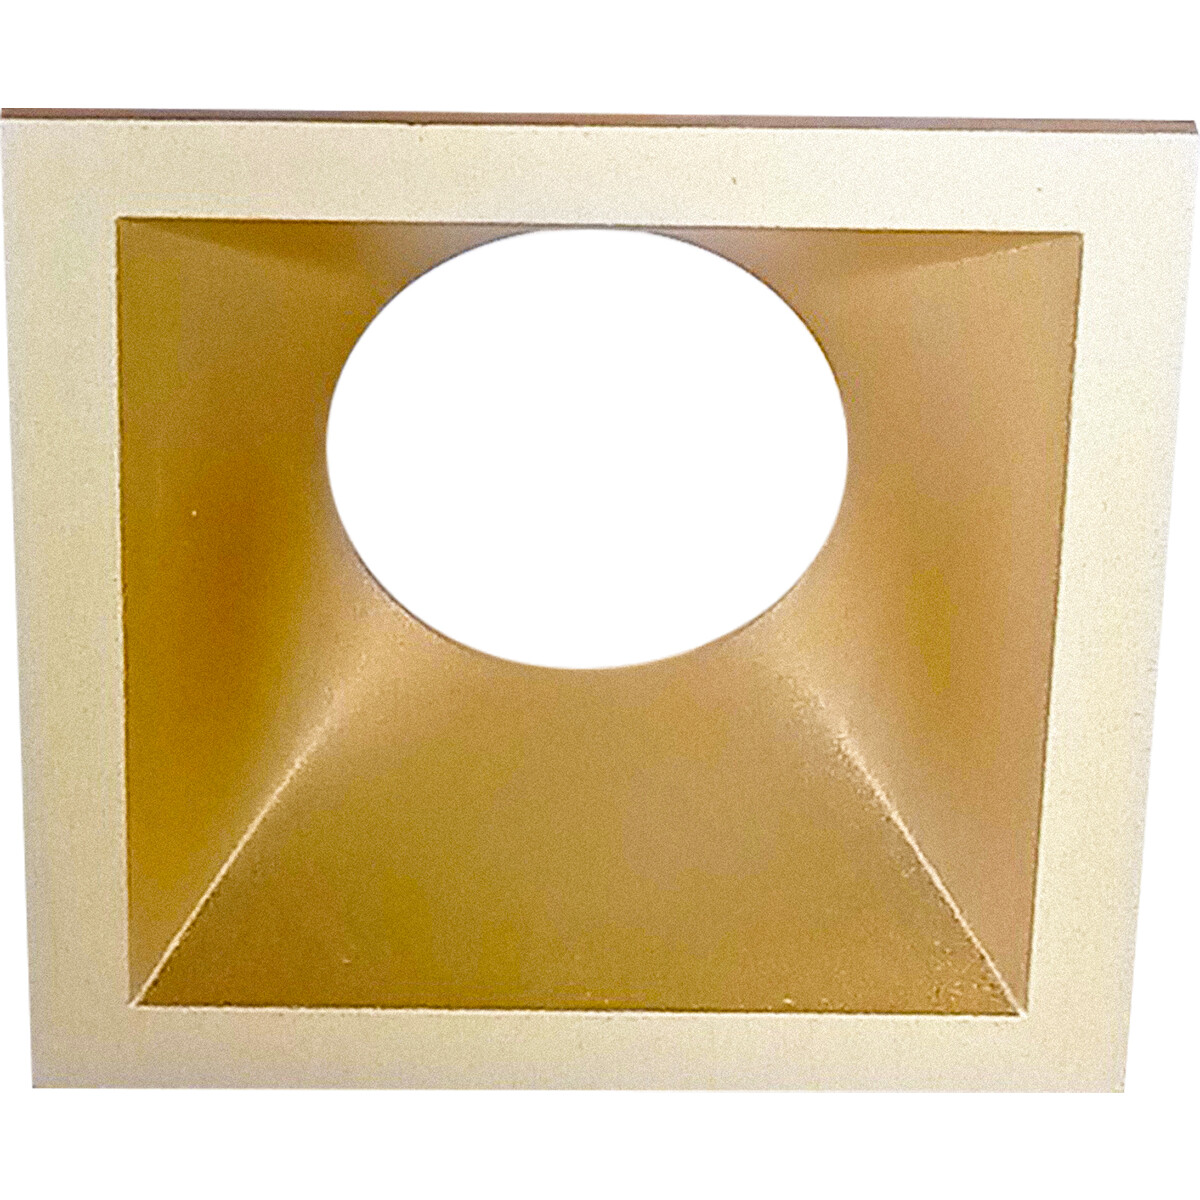 Spot Ring - Pragmi Cliron Pro - Vierkant - Mat Goud